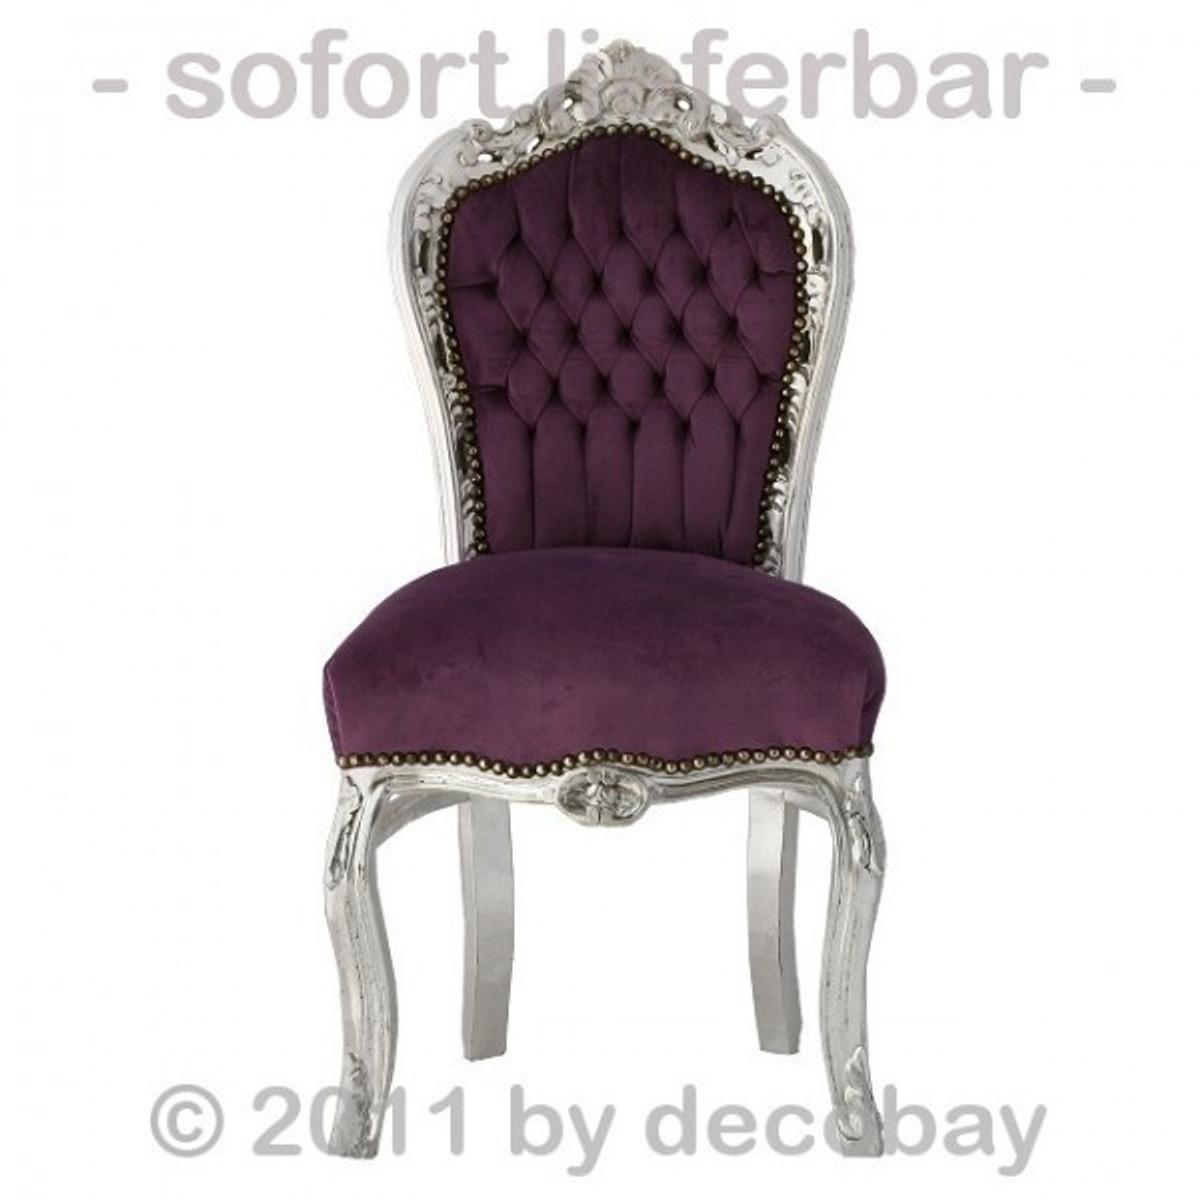 stuhl alt stuehle barock esstisch stuh lila silber f r romantisches m dchenzimmer oder anmutig. Black Bedroom Furniture Sets. Home Design Ideas